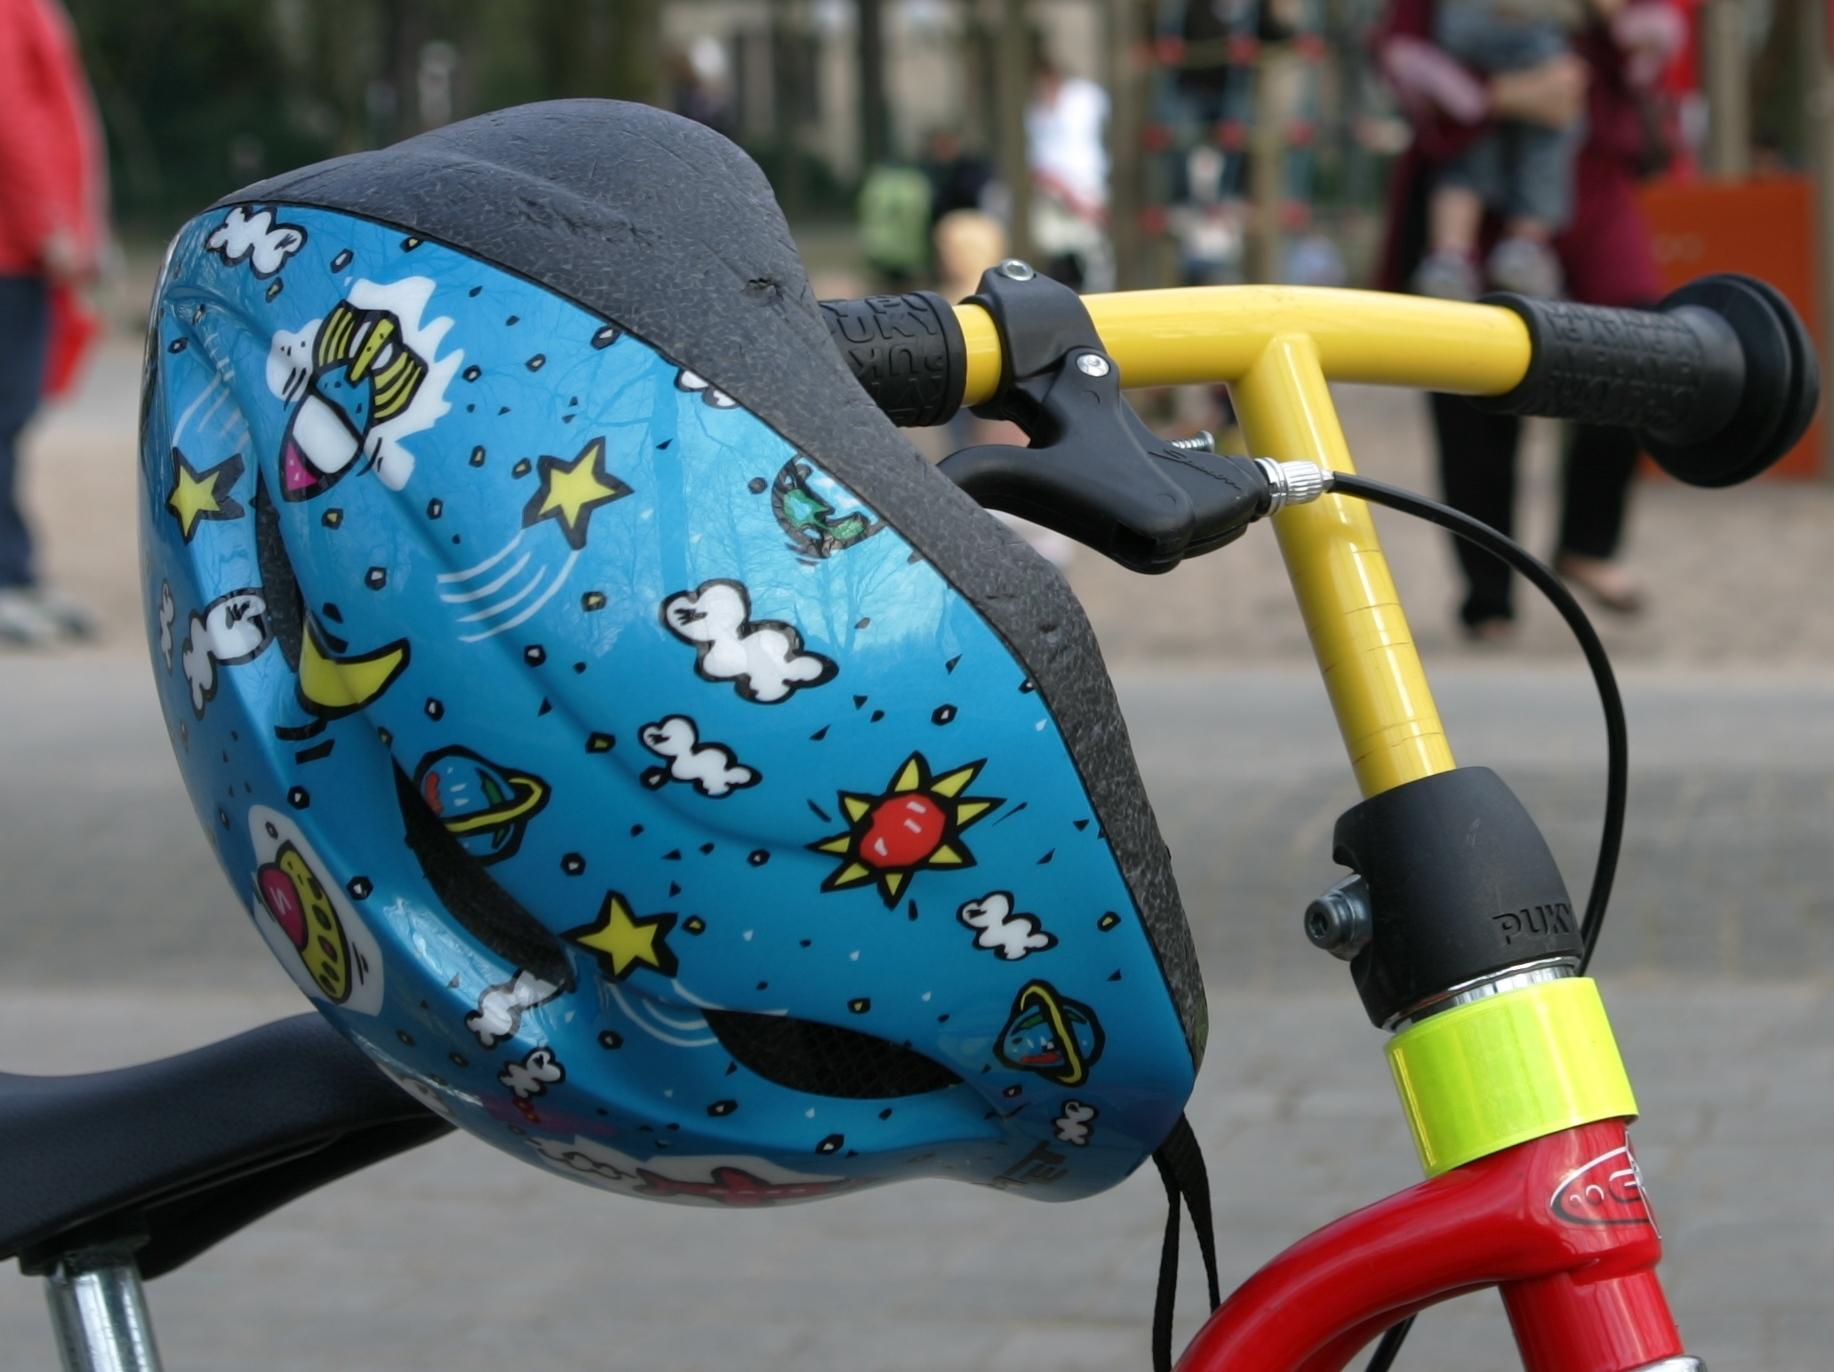 Helm am Fahrrad gross JPG